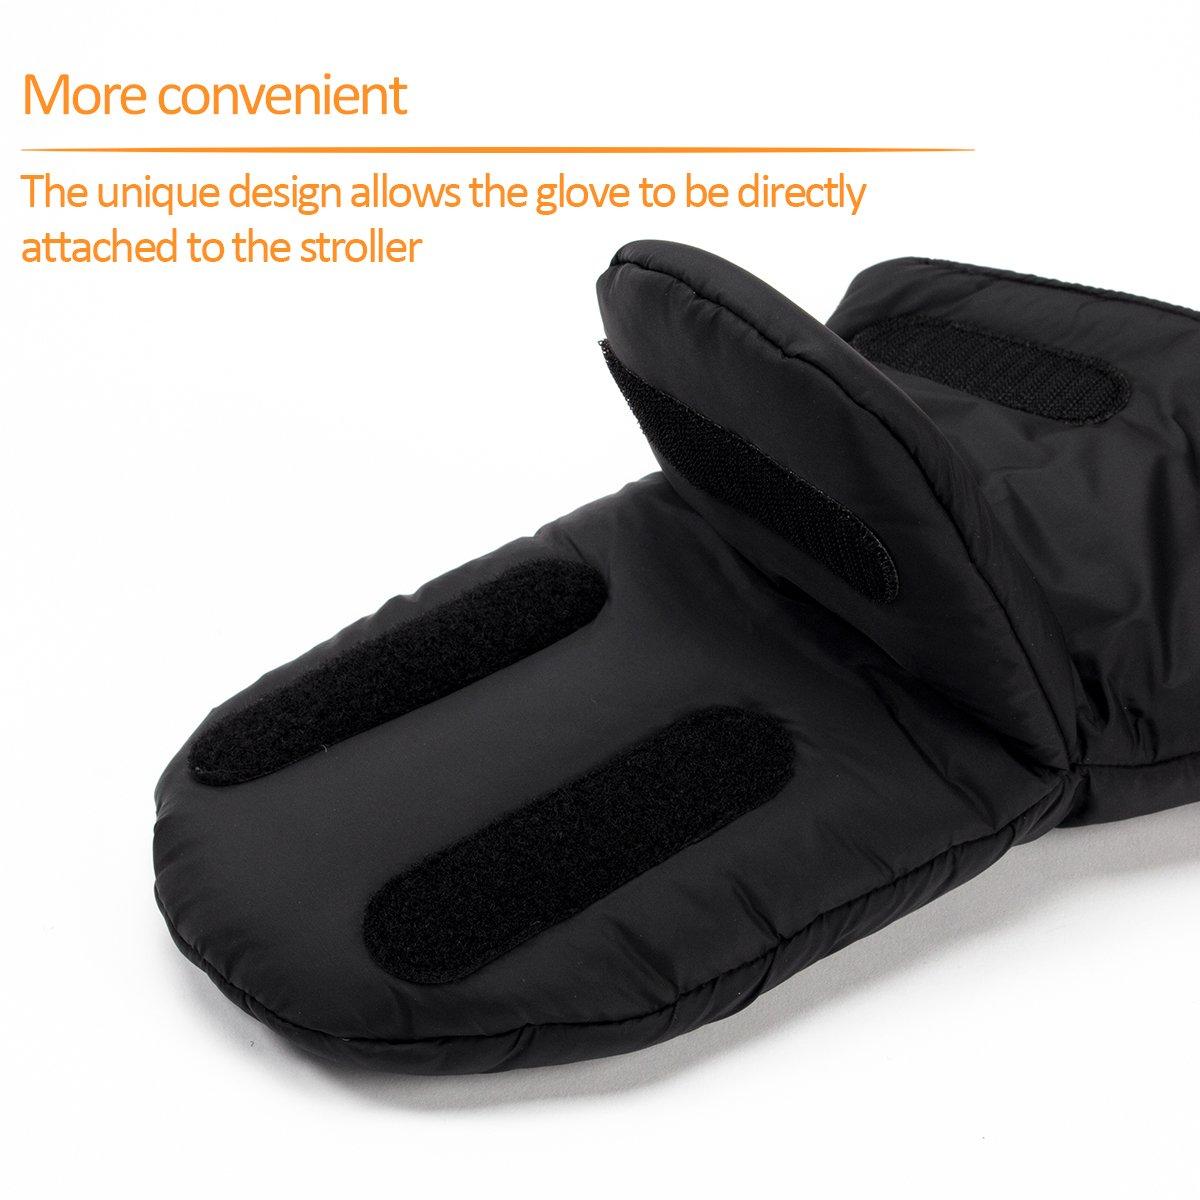 Biubee Stroller Hand Muff Winter Warm Pram Mitten Gloves for Parents and Caregivers Waterproof Anti-Freeze Black by Biubee (Image #5)